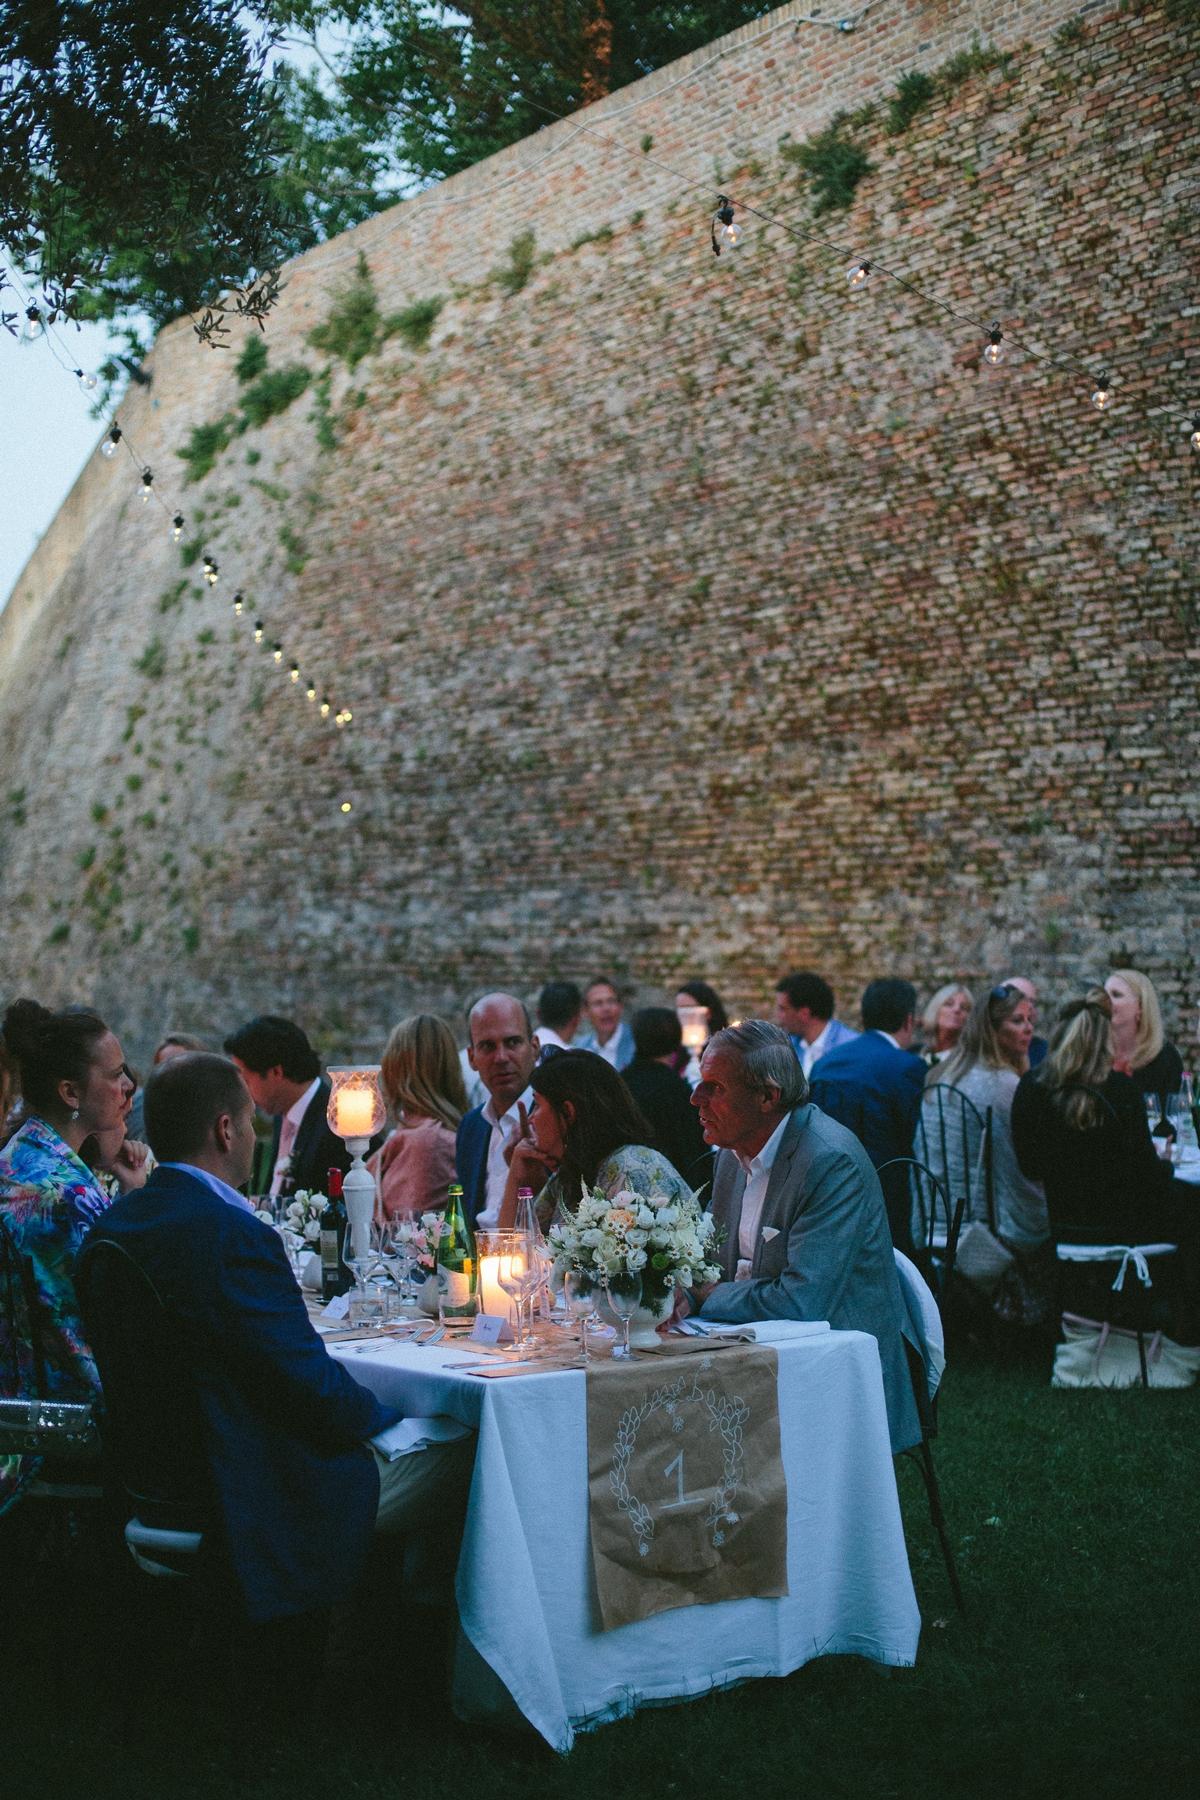 wedding-table-n-1-montegridolfo.jpg